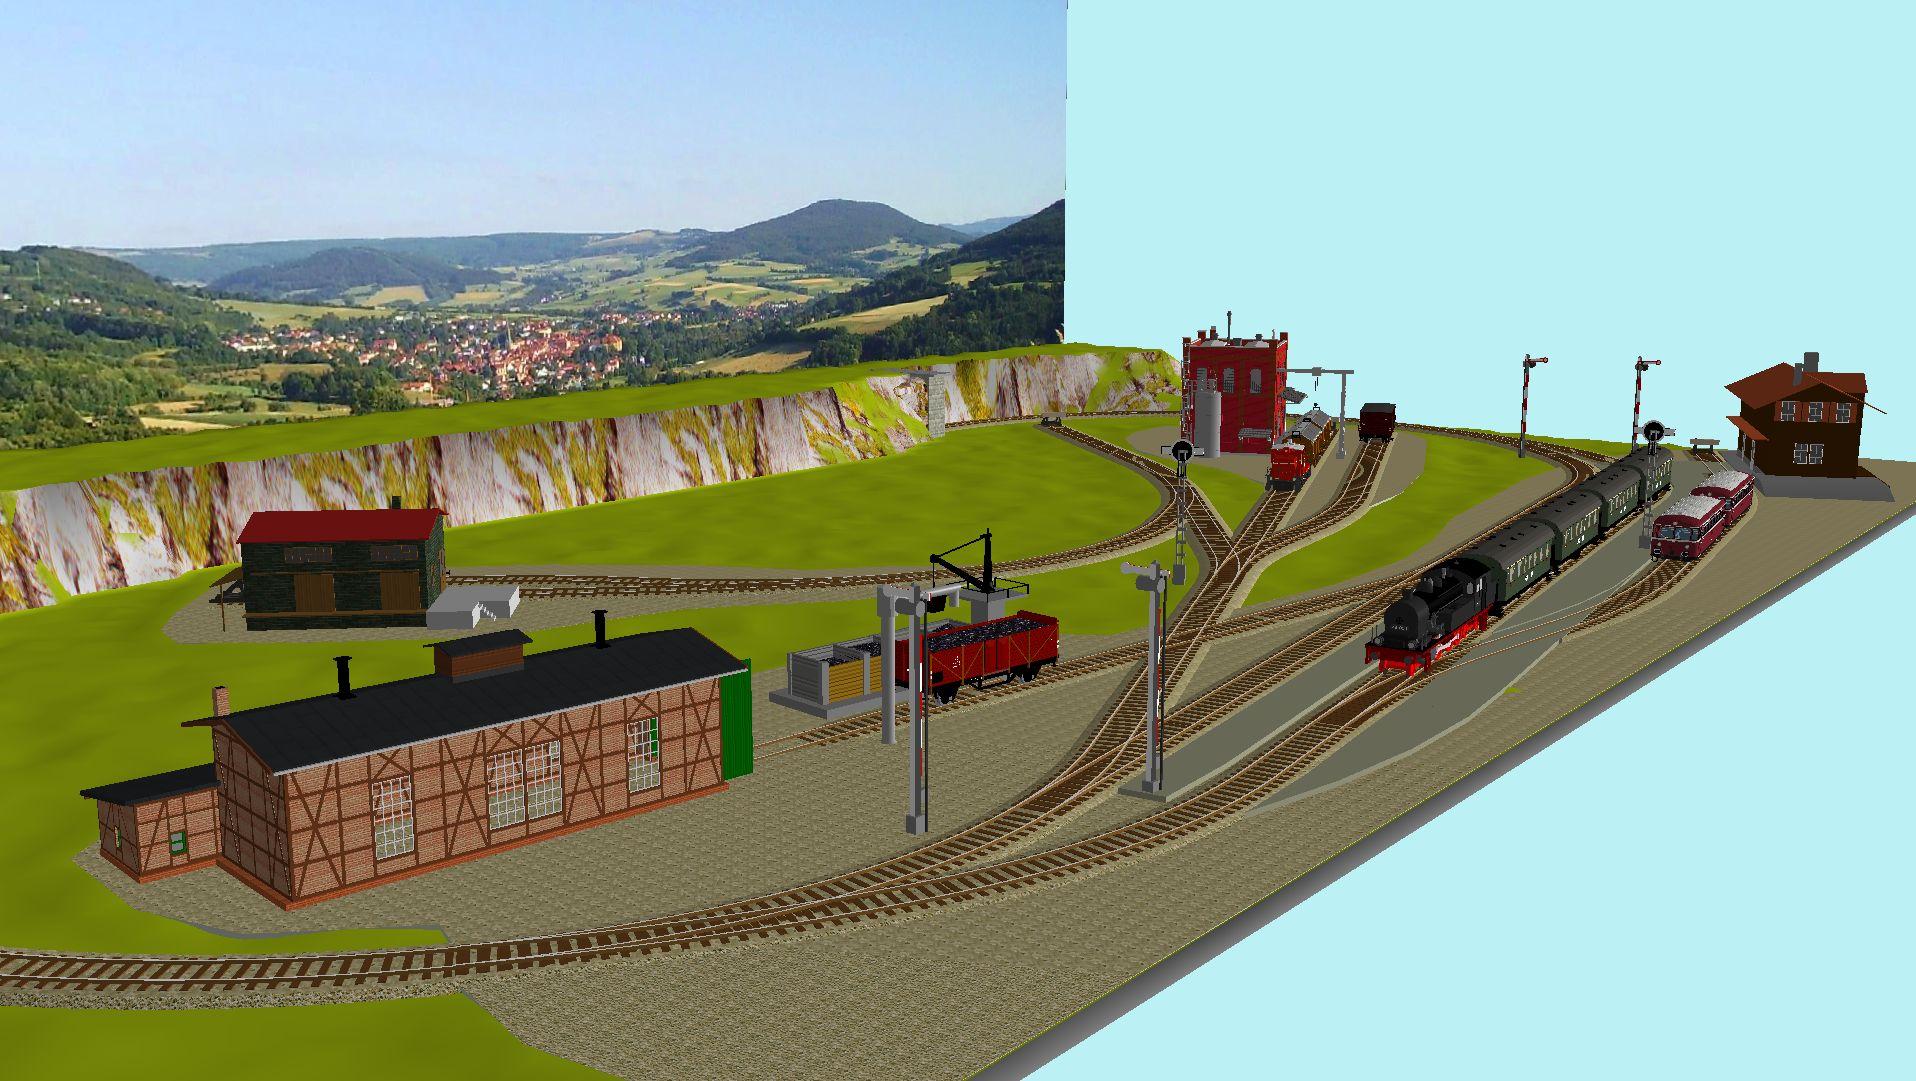 'ALBA Modellbahnpraxis' Band 1, Plan 5 Amp-1_5_3npk6p